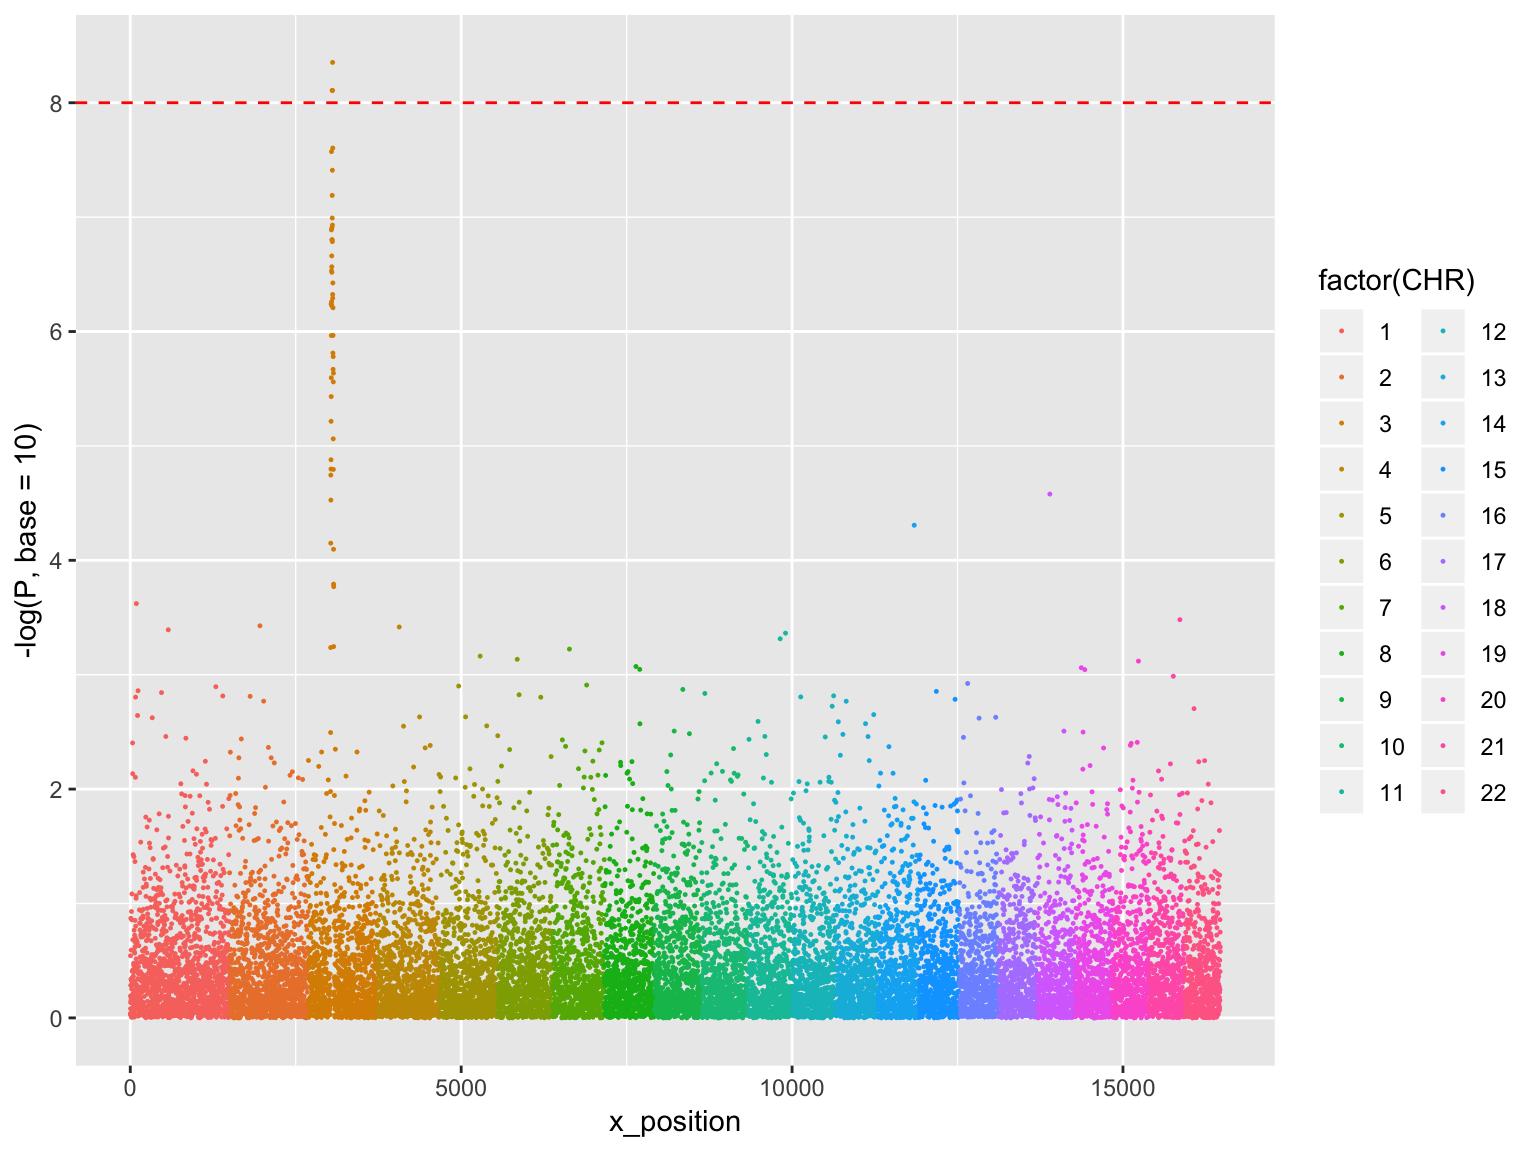 Lecture 4: Data Visualization